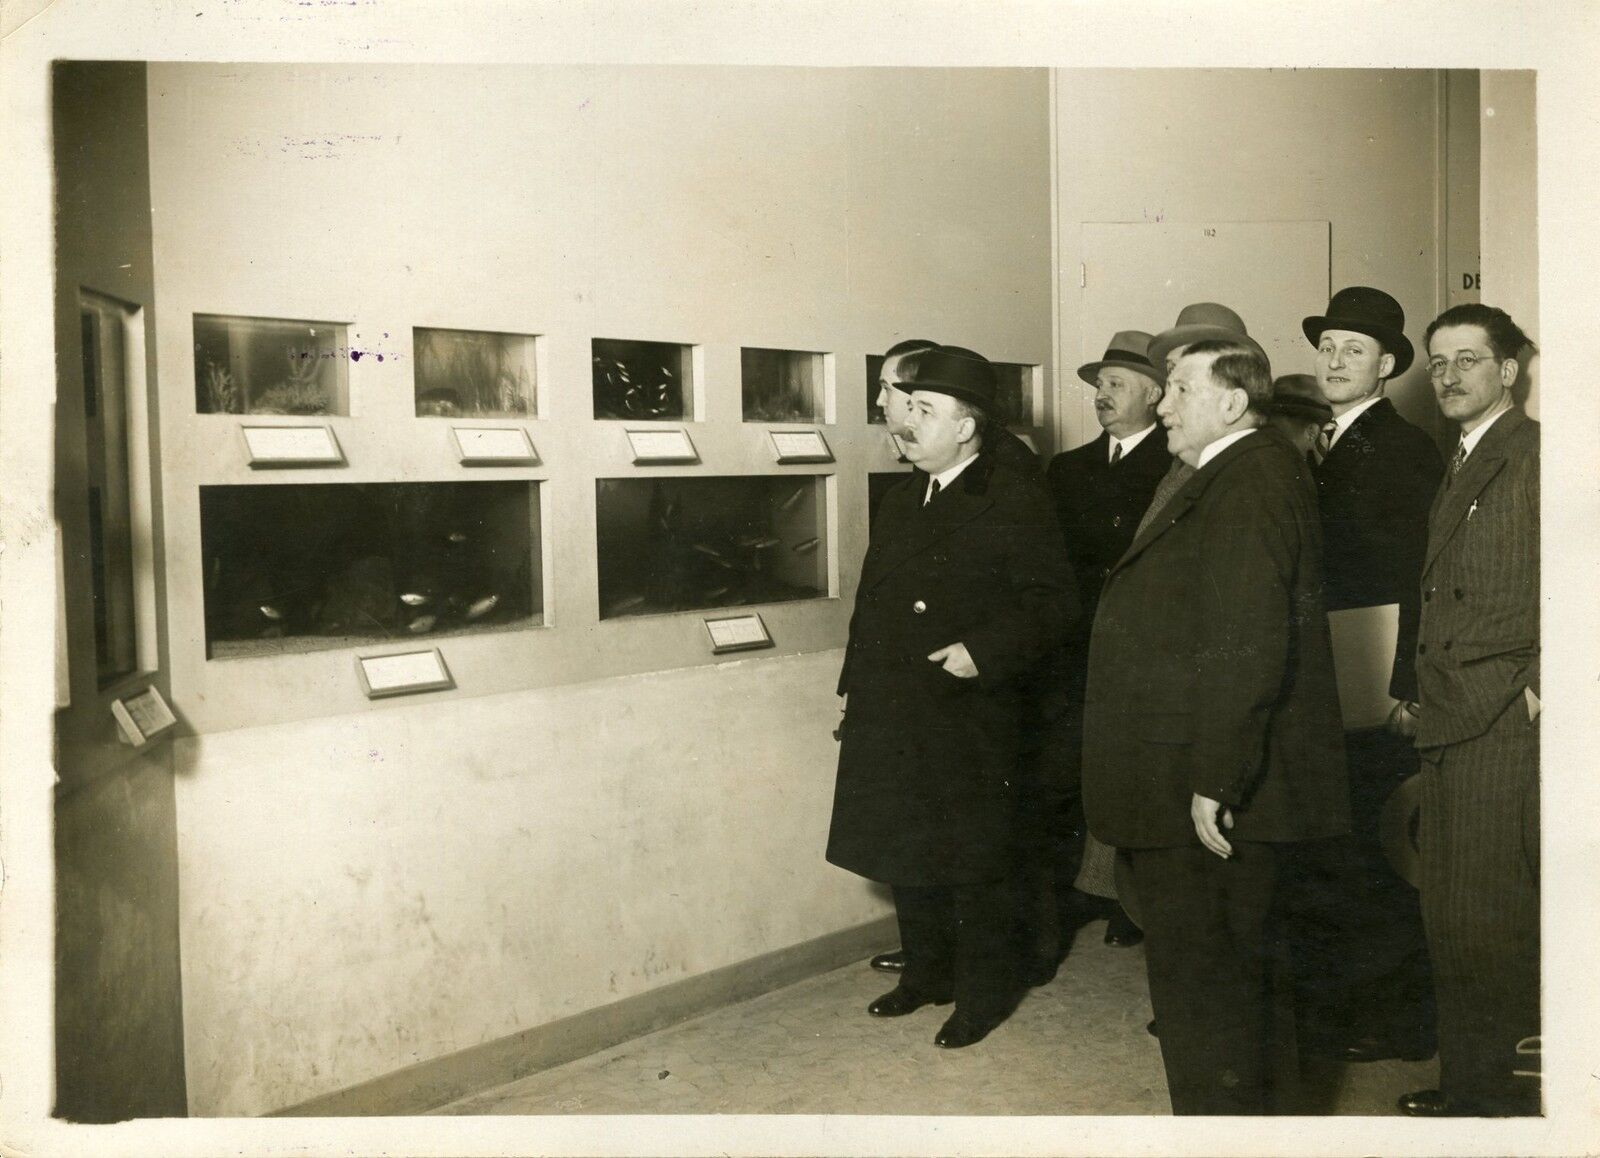 AQUARIUM au MUSEE PERMANENT des COLONIES 1931  Photo orig. G. DEVrot  Agce ROL